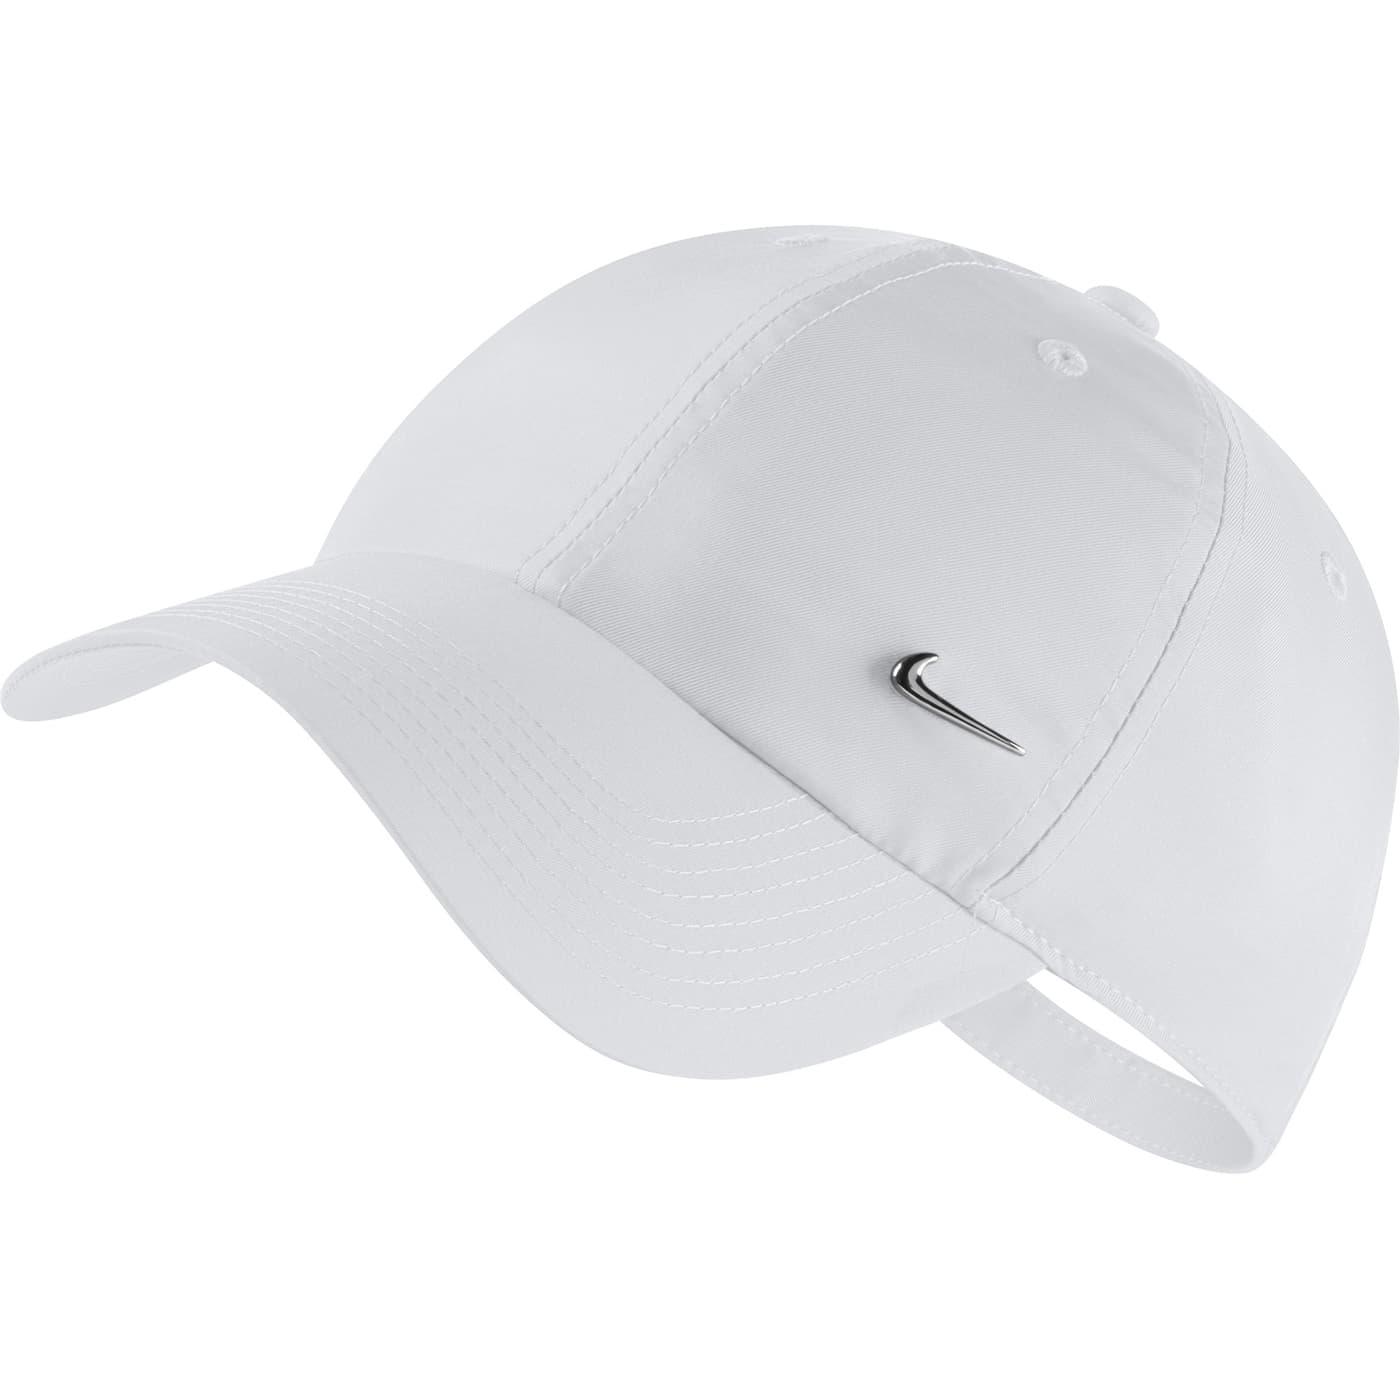 d24cd7128f948 Heritage86 Cap Nike Sportswear UnisexeMigros Casquette eoCBrxWd